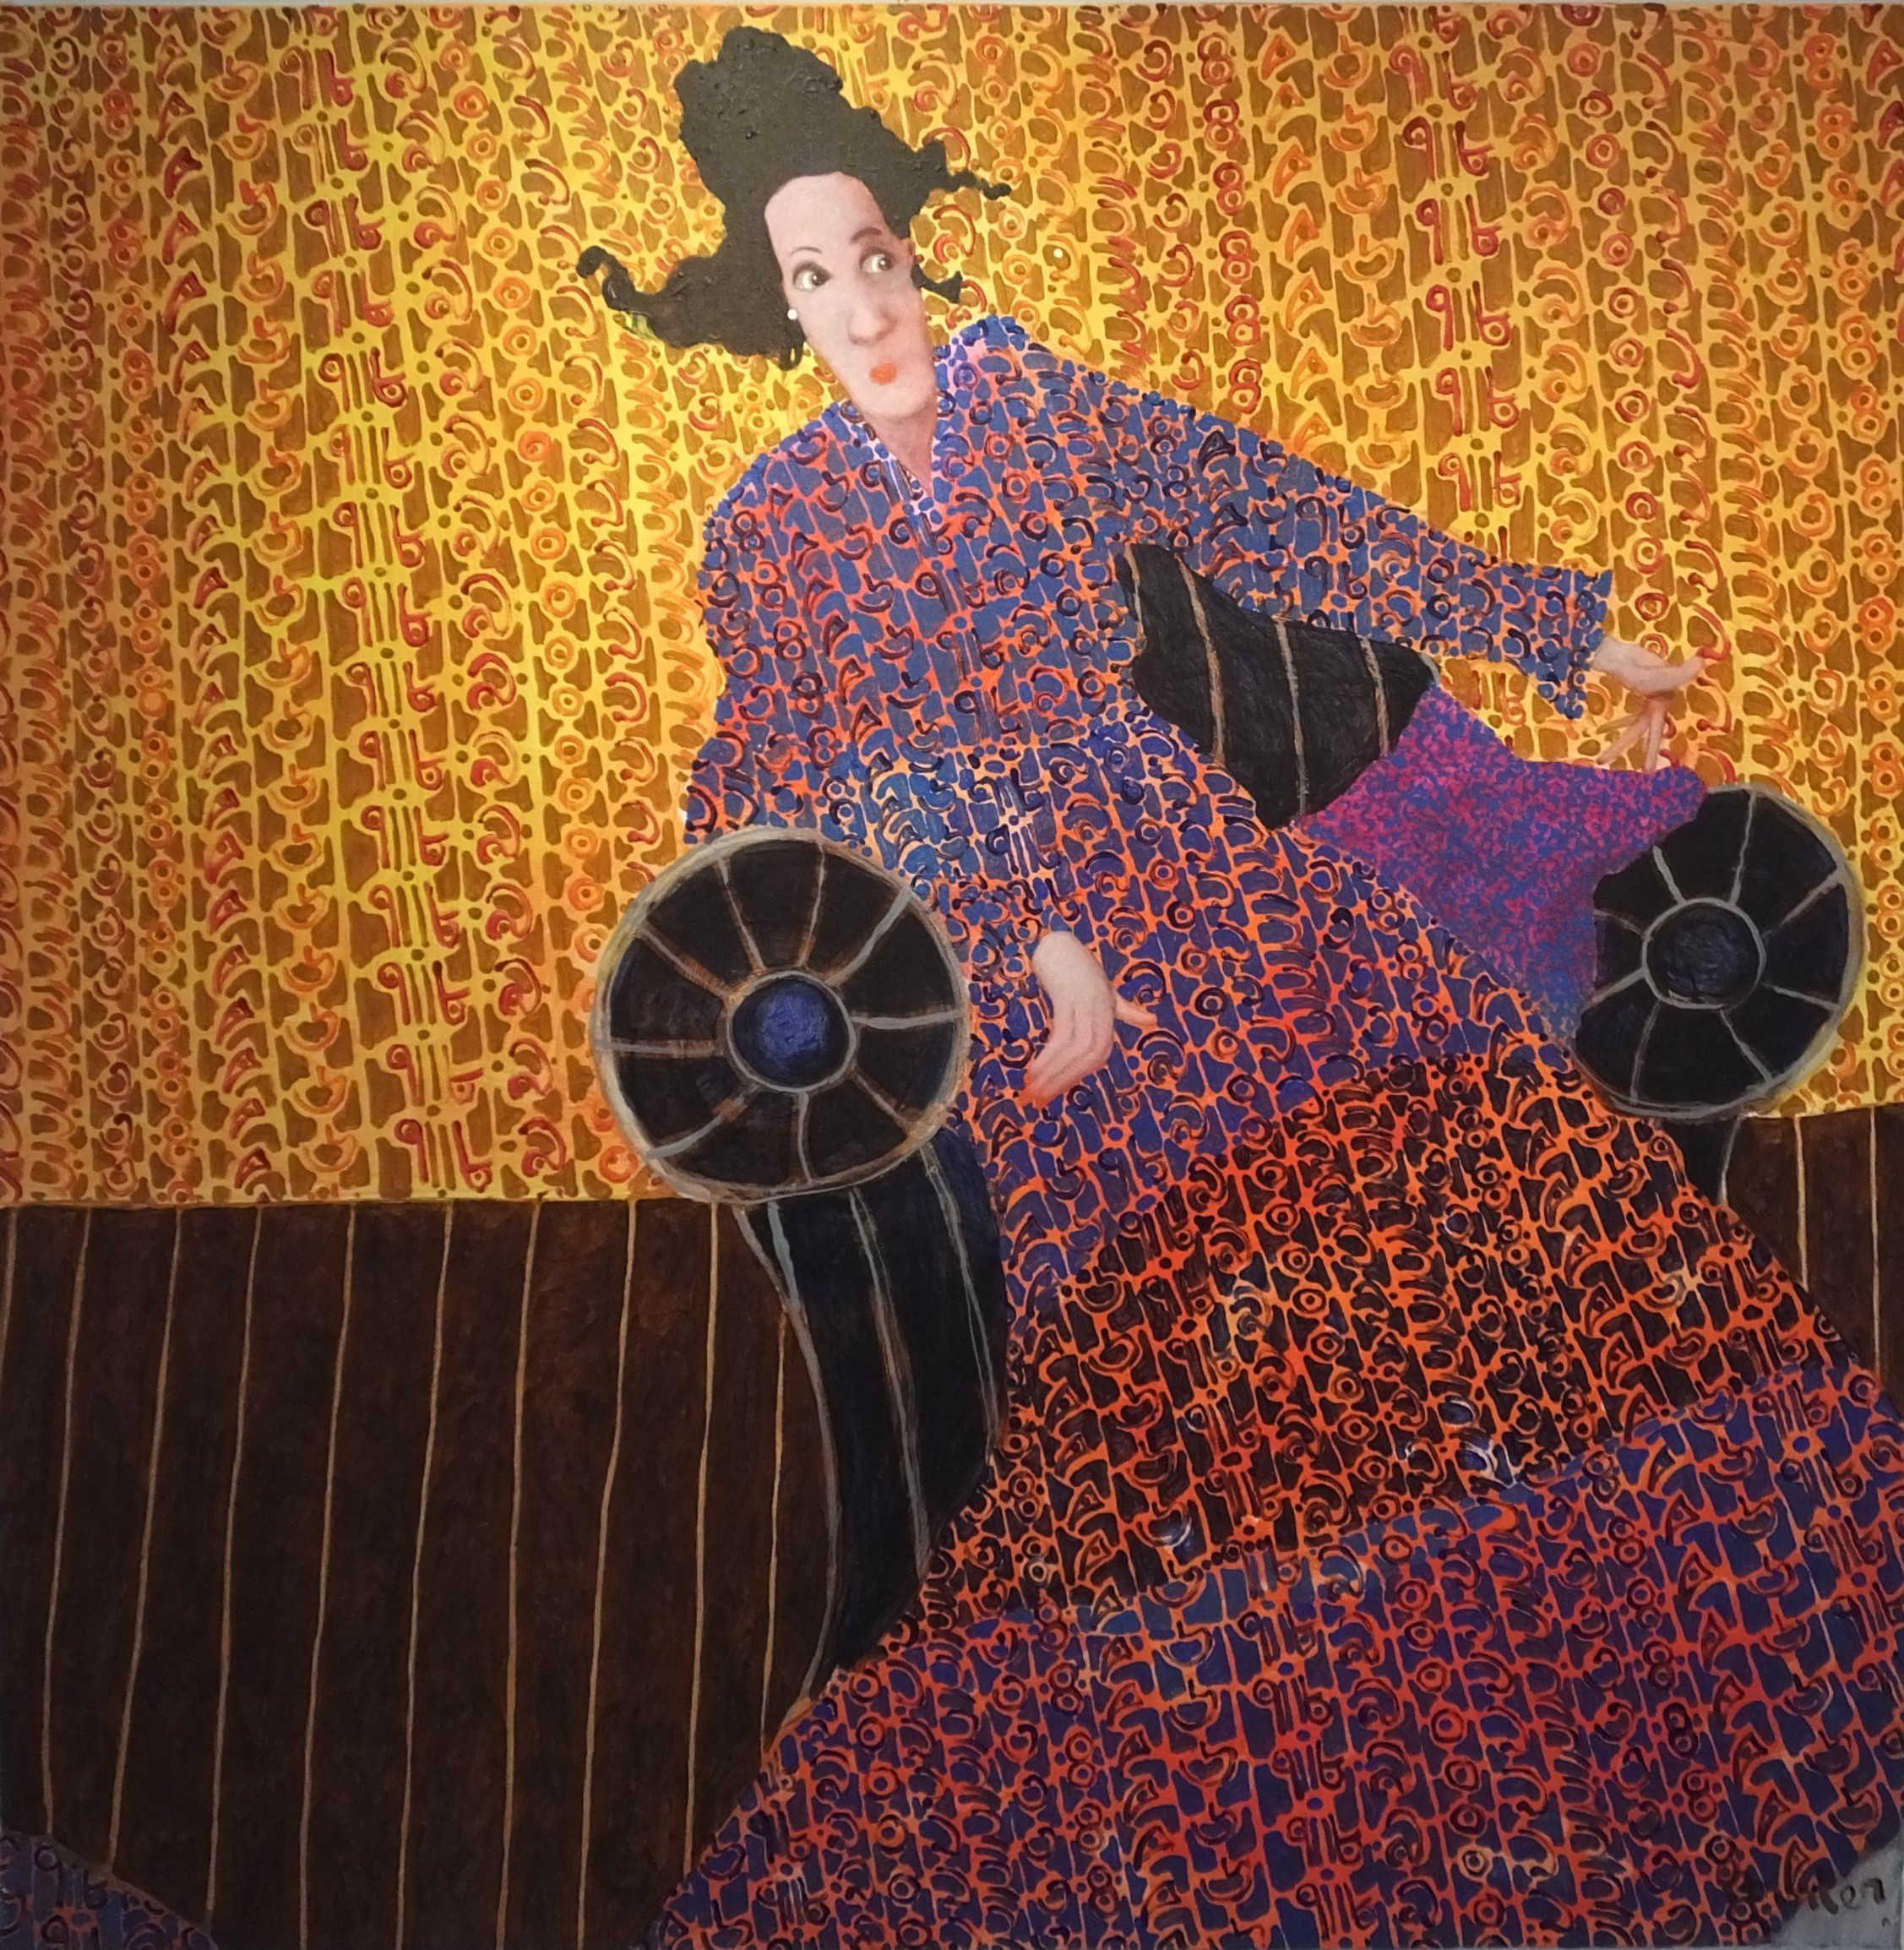 Galerie Maznel Andrew Painter Peinture Avec Images Peinture